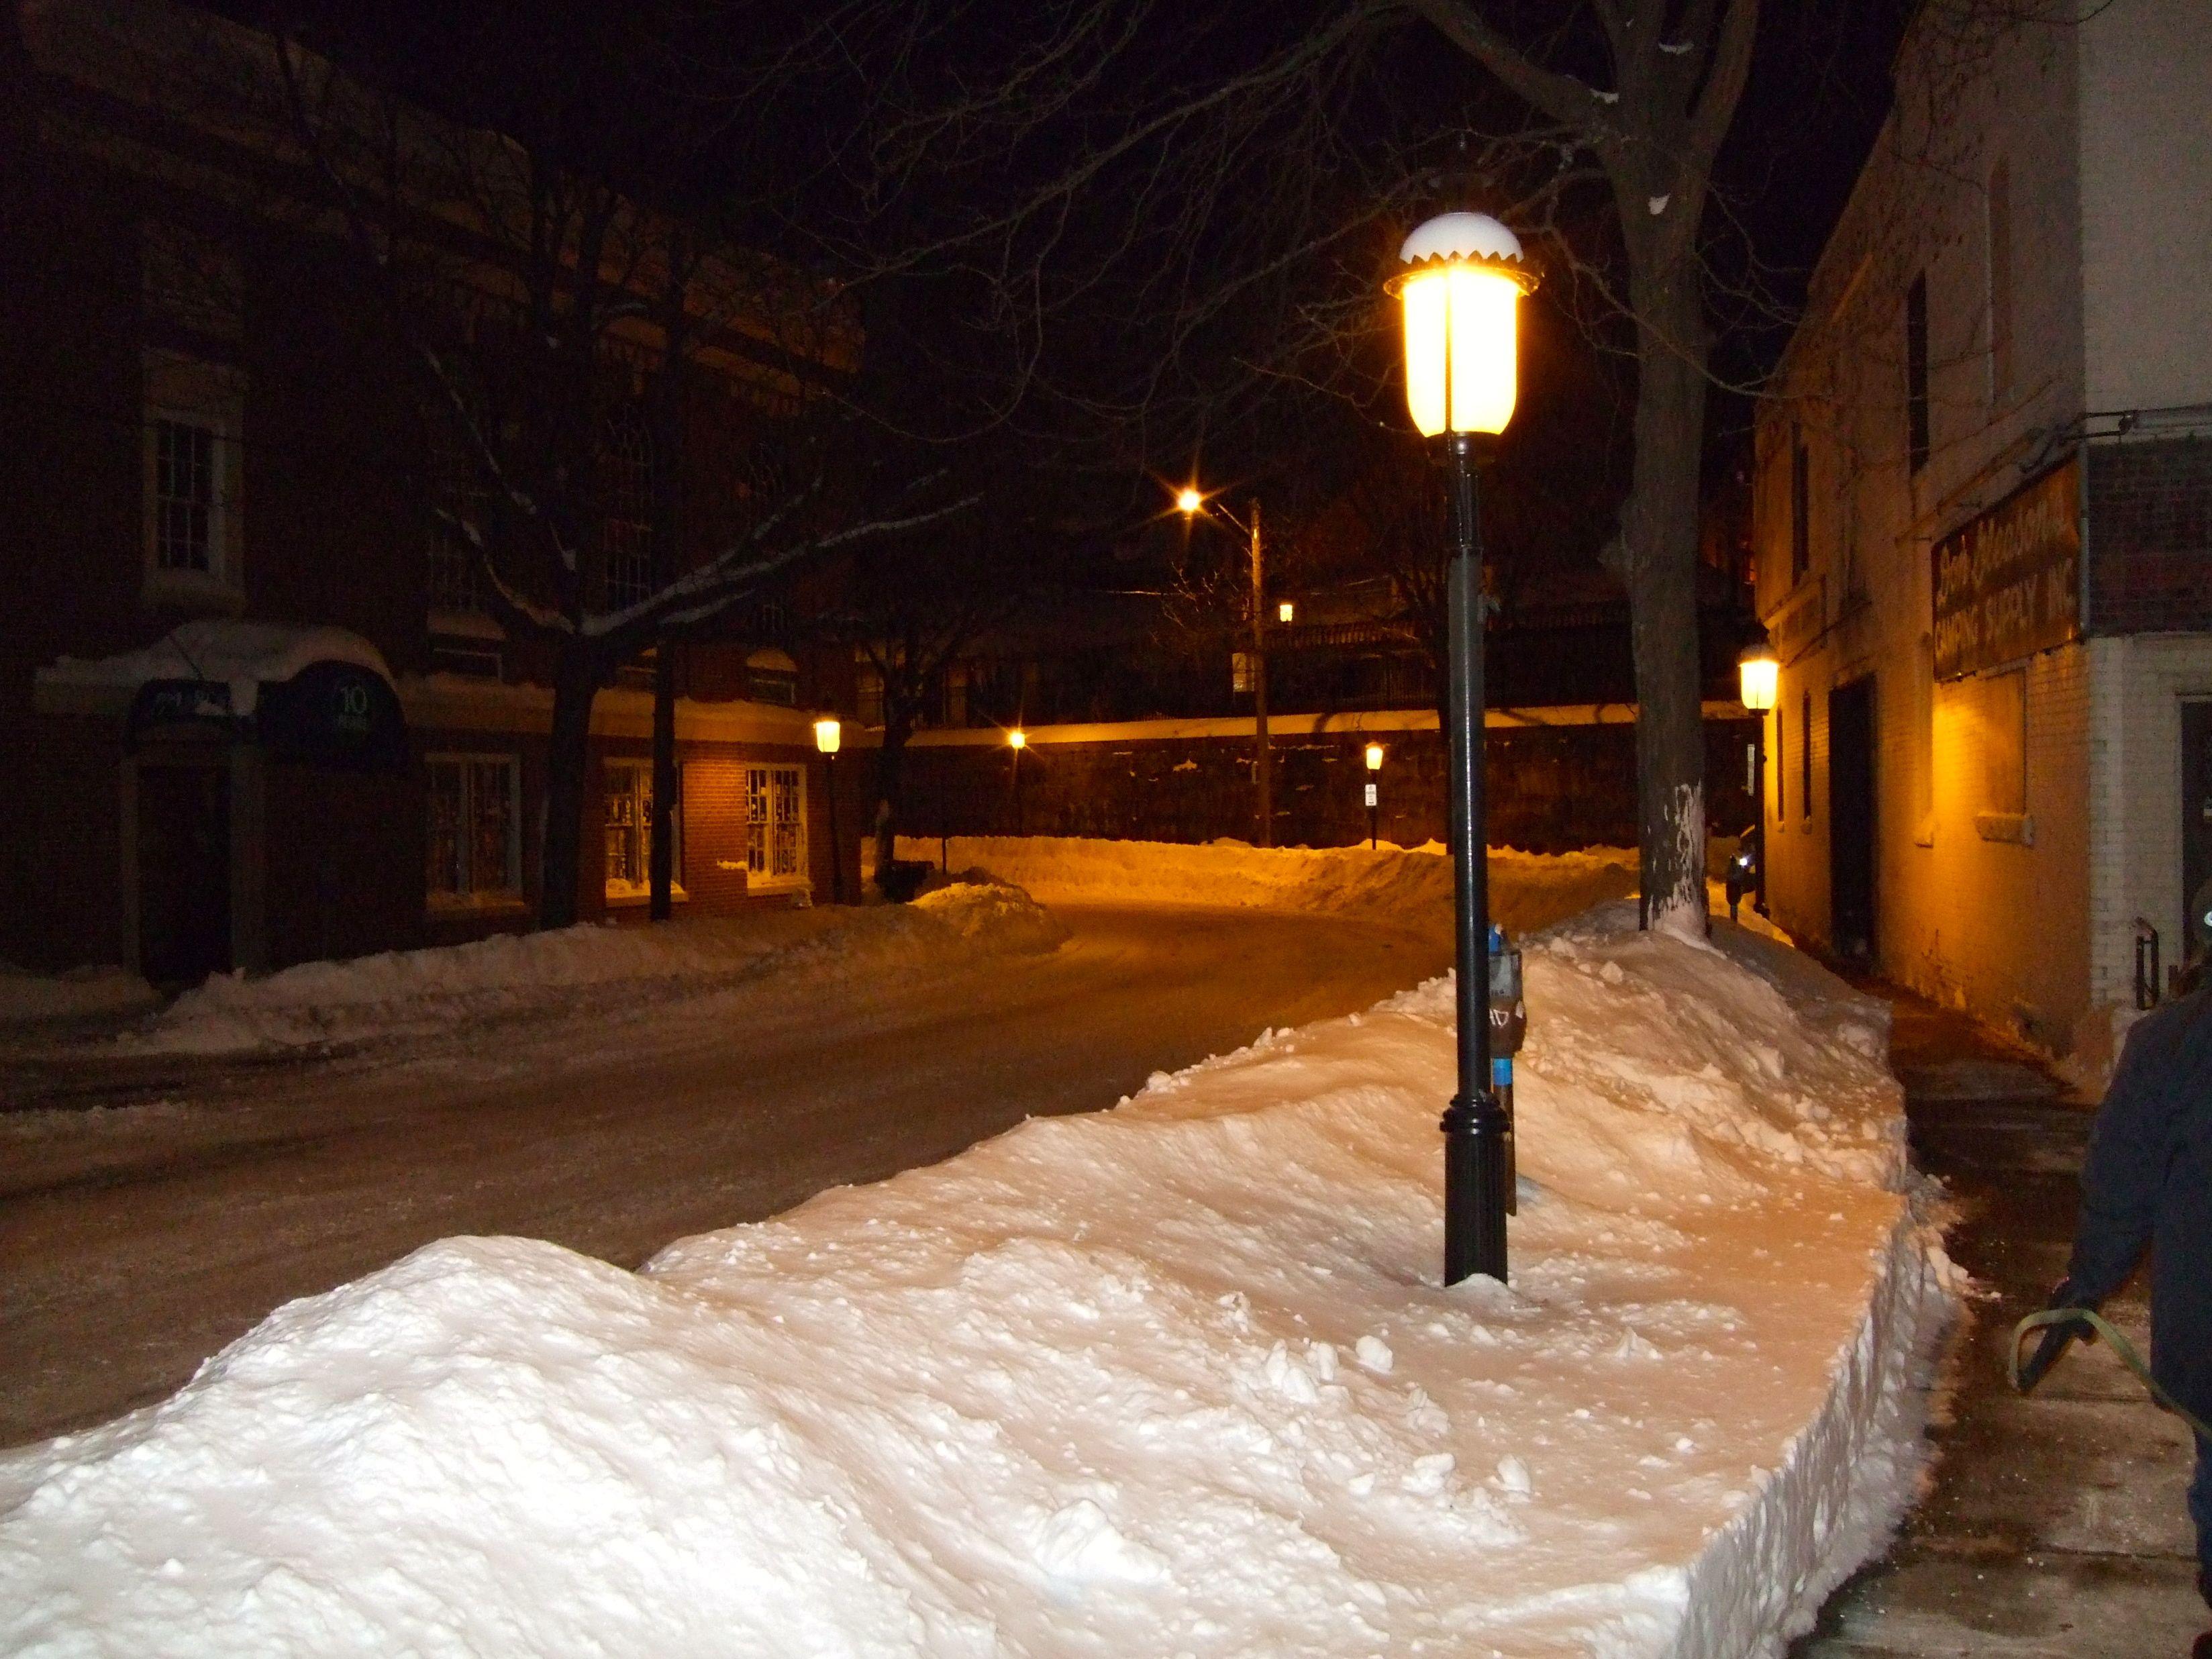 Northampton & winter snow